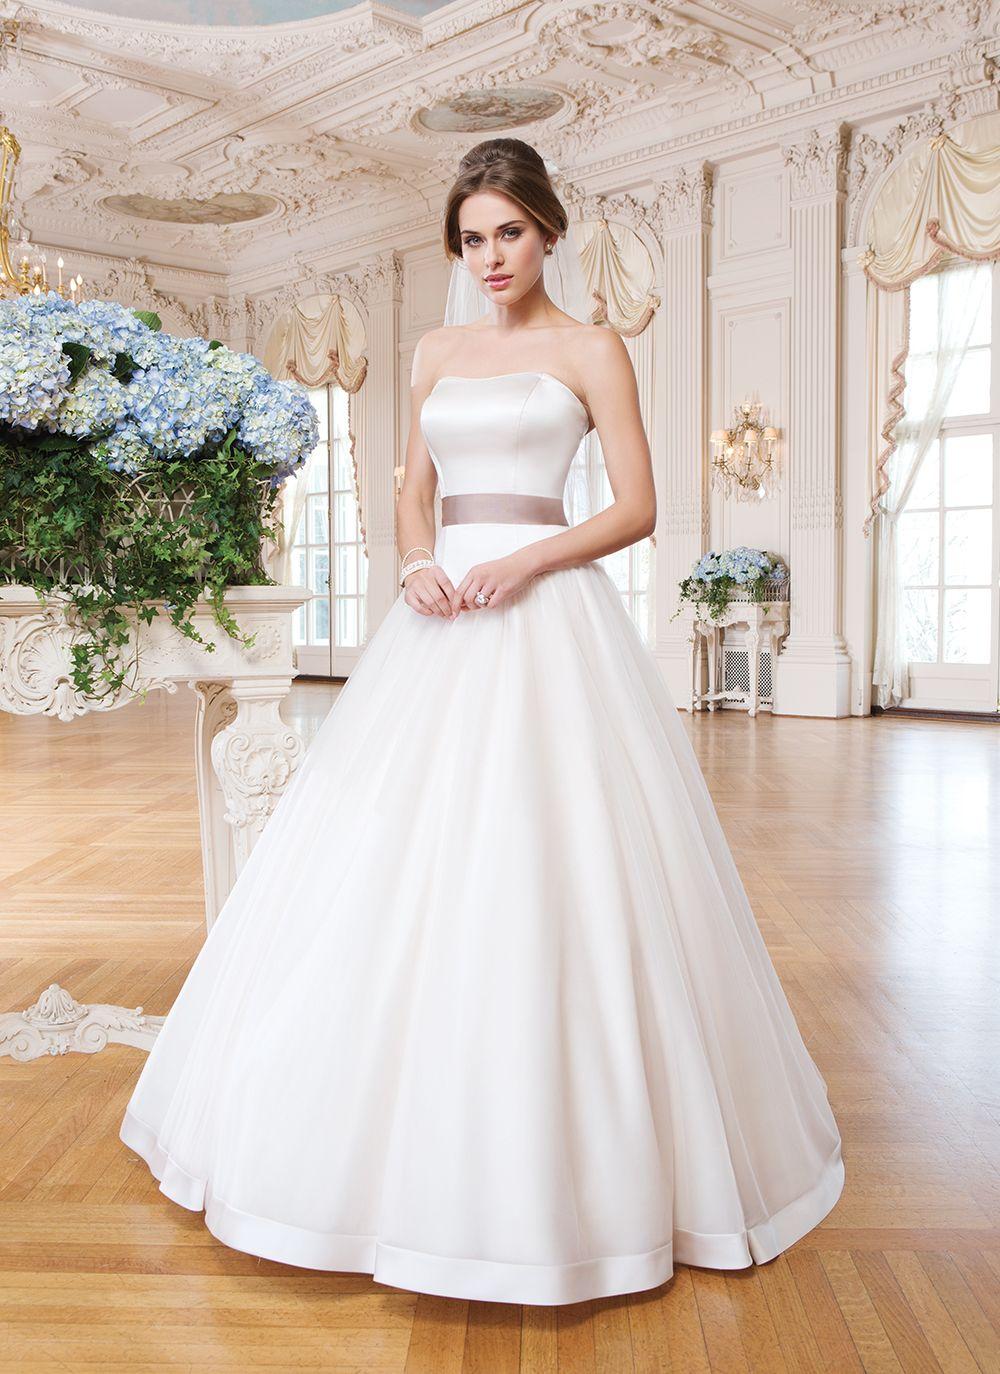 Lillian west wedding dress  Lillian West lillian west style  Tulle matte satin ball gown